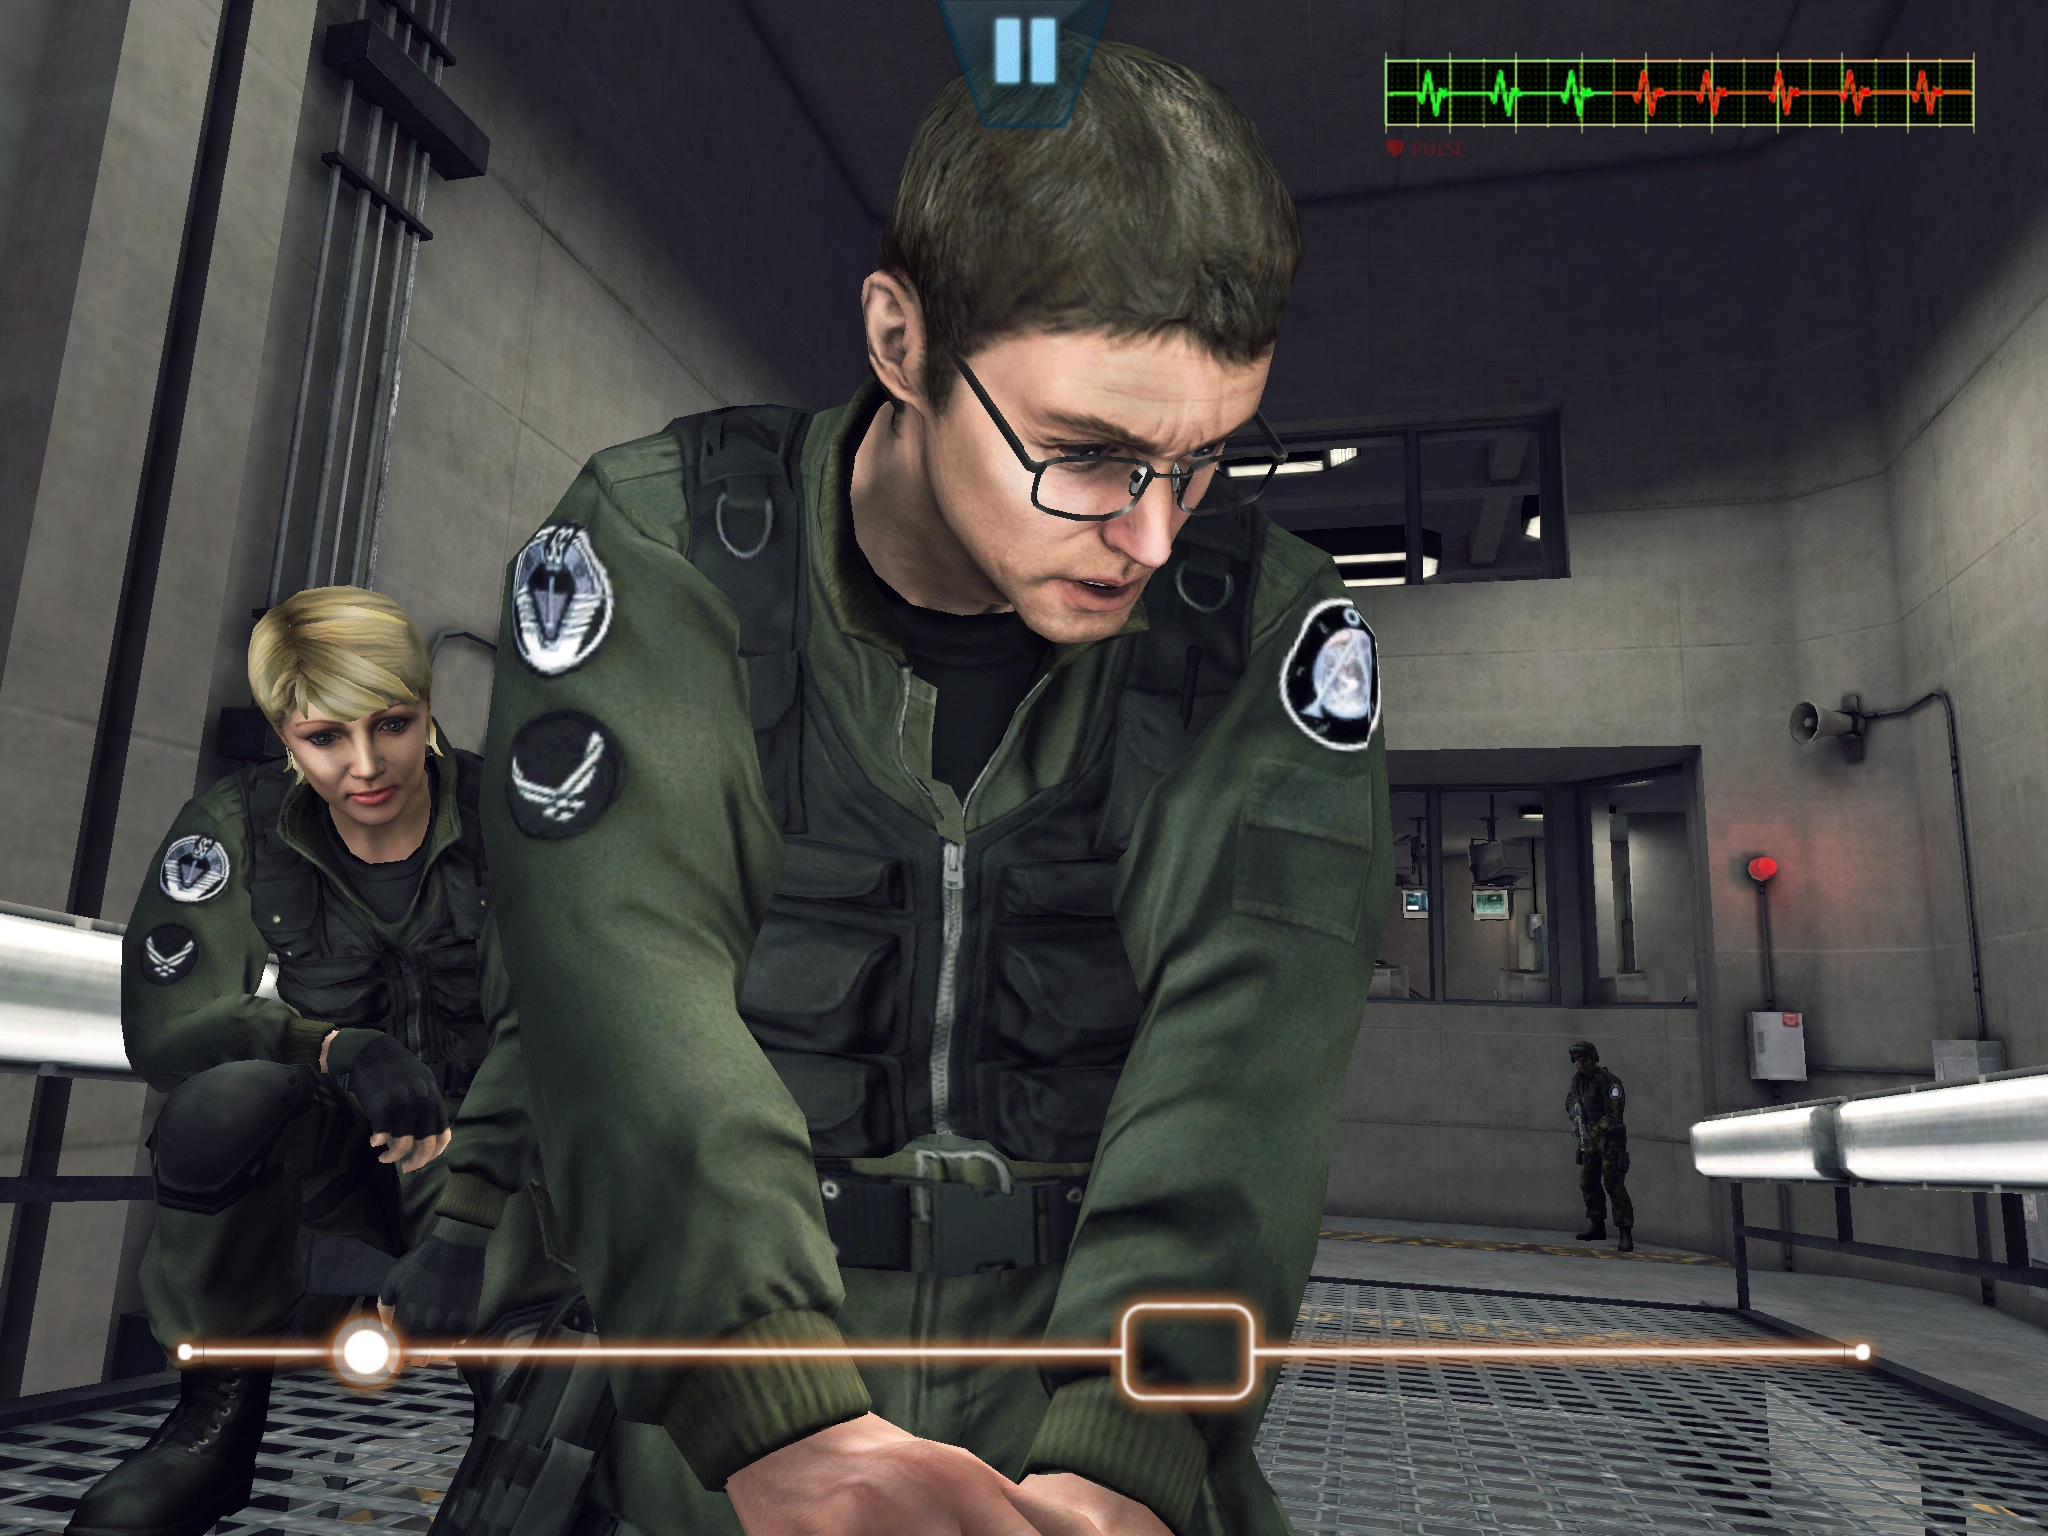 Stargate Sg1 Episoden